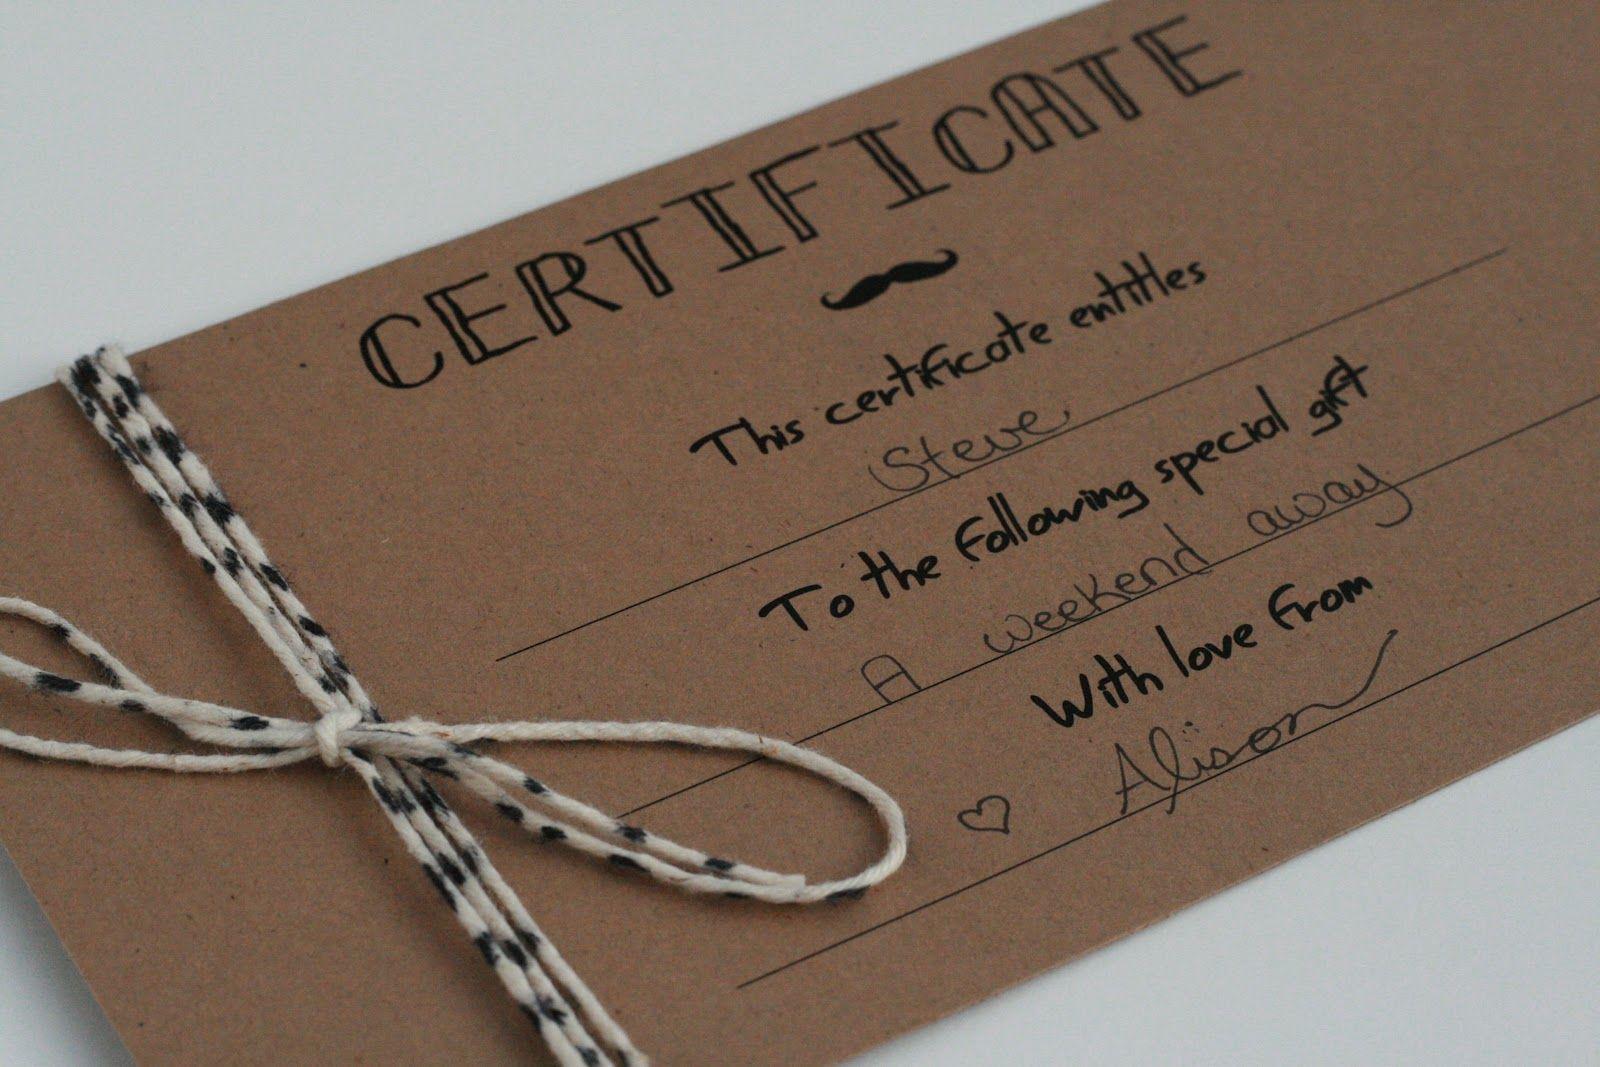 gift certificate certificates printable diy template templates gifts cadeau handmade husband blank homemade card cards petit voucher christmas vouchers manly